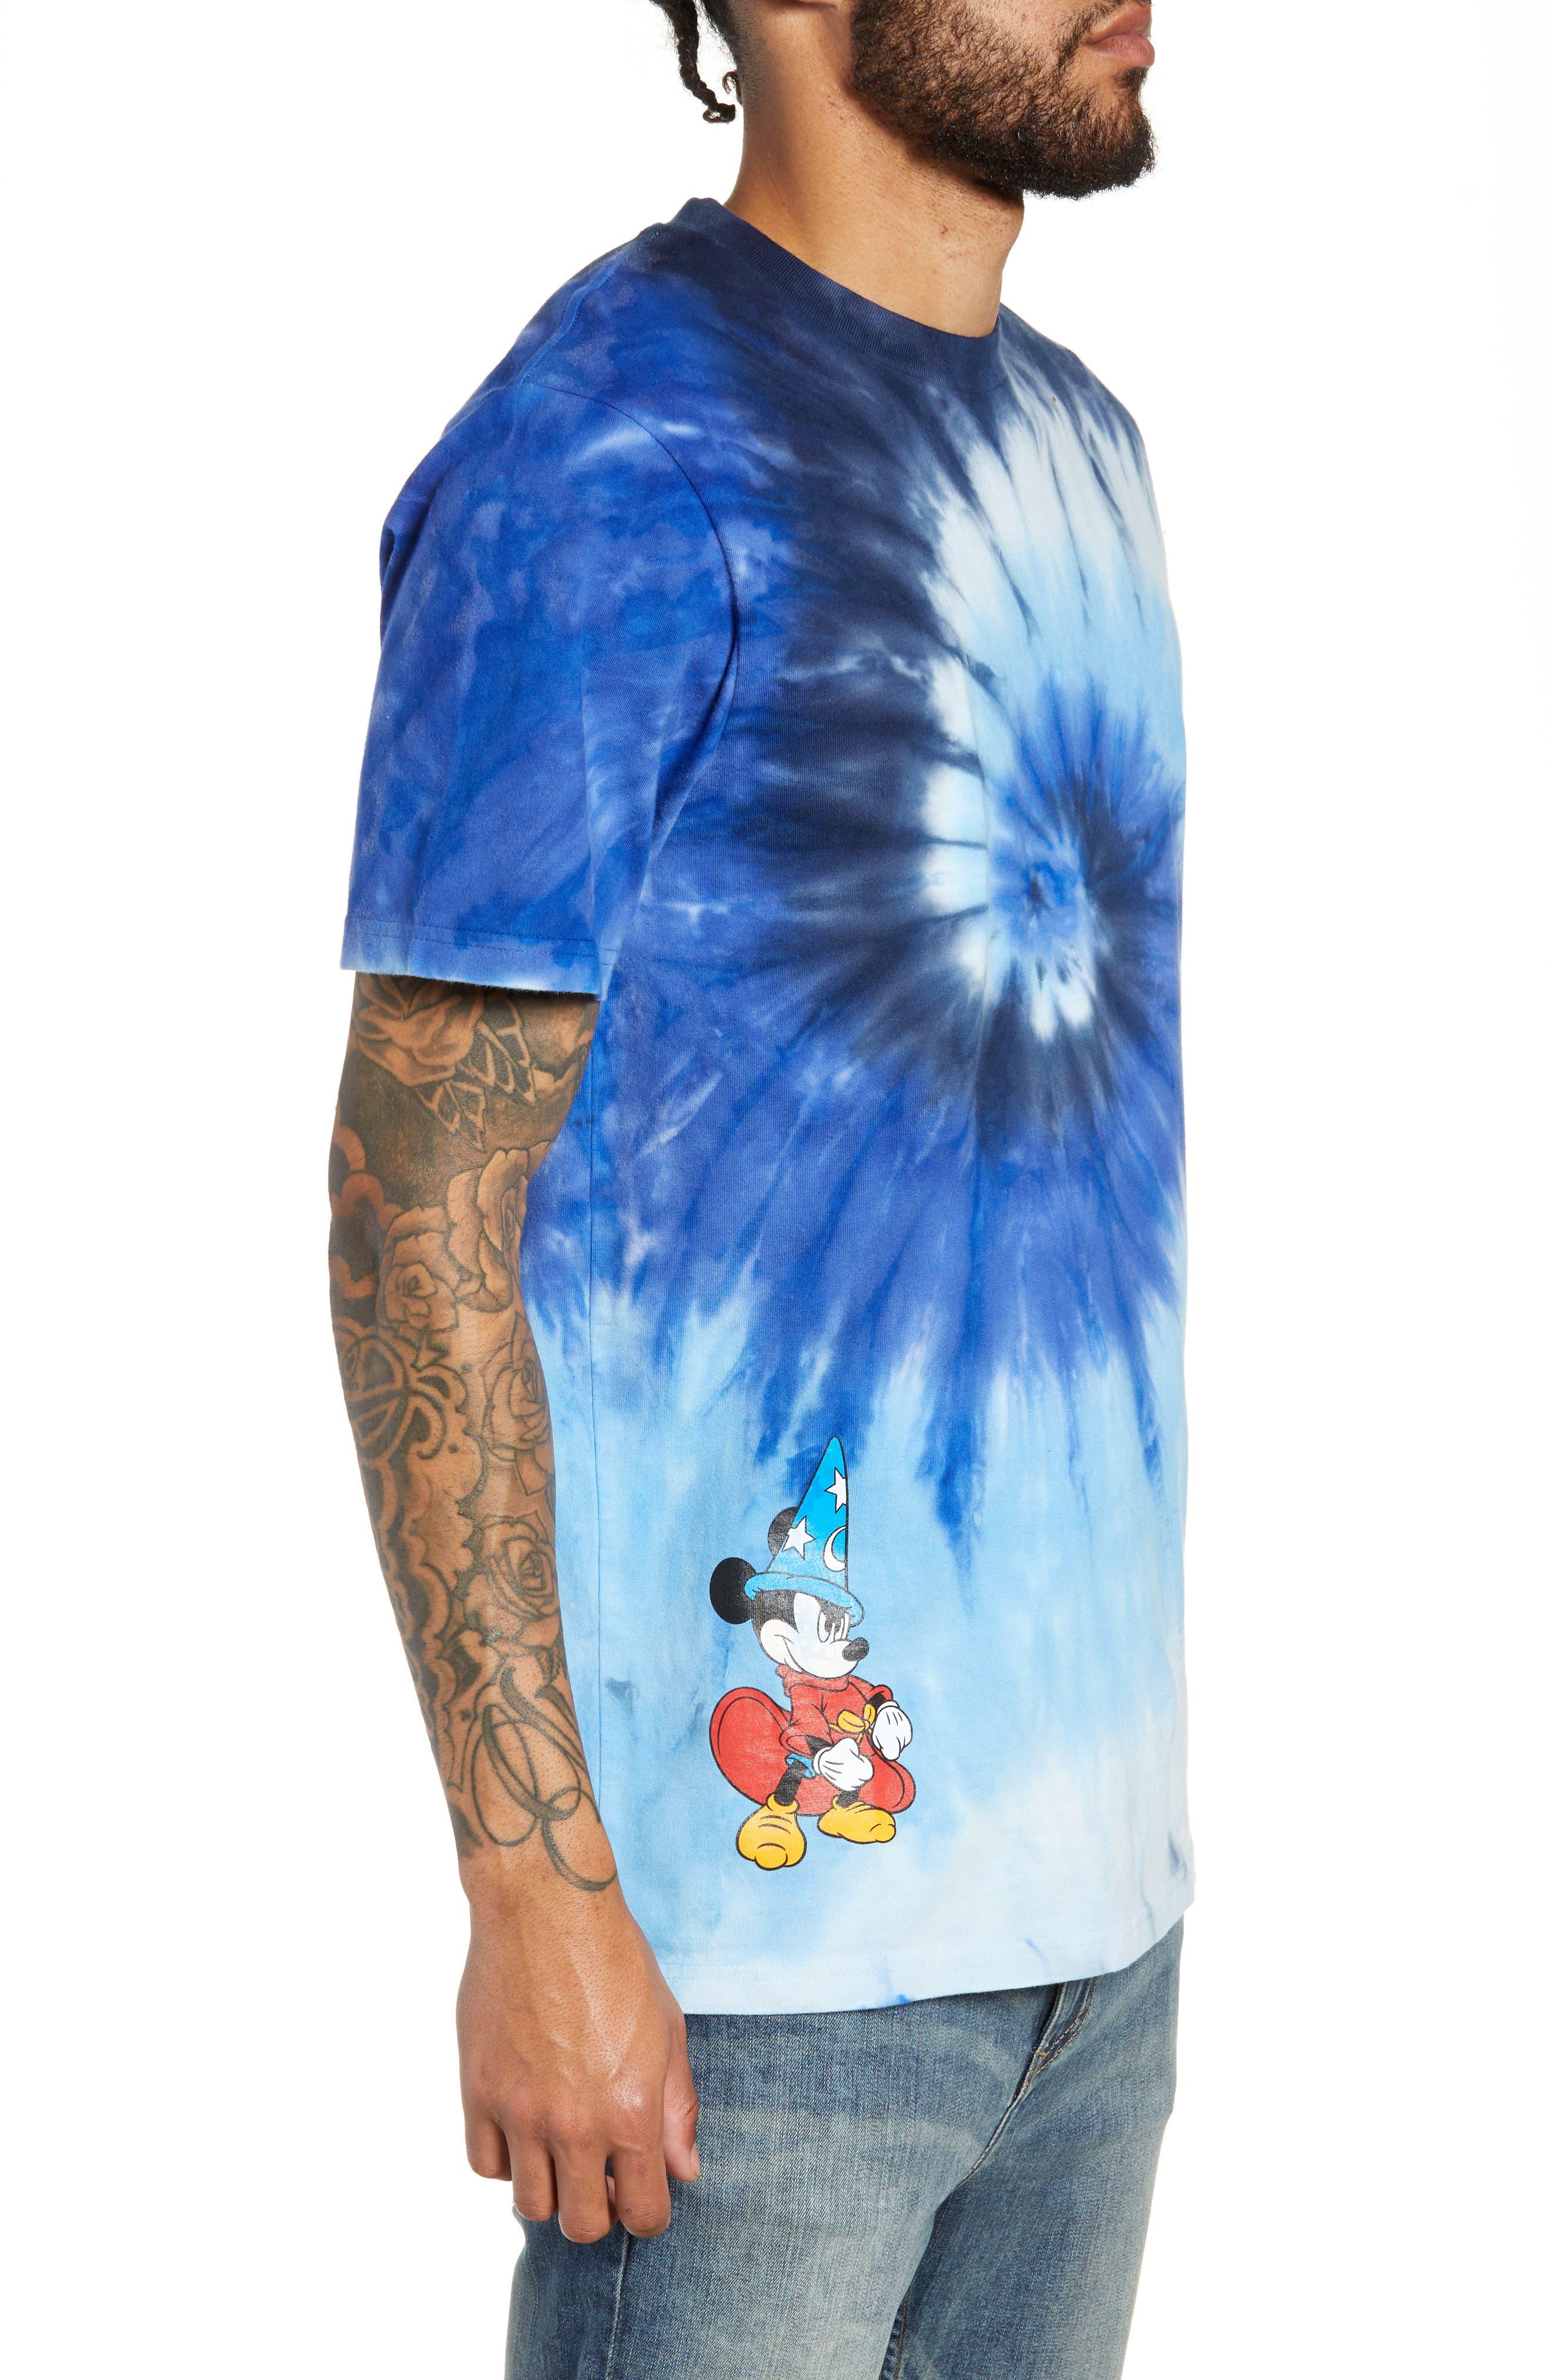 x Disney Mickey's 90th Anniversary T-Shirt,                             Alternate thumbnail 3, color,                             MICKEY FANTASIA TIE DYE